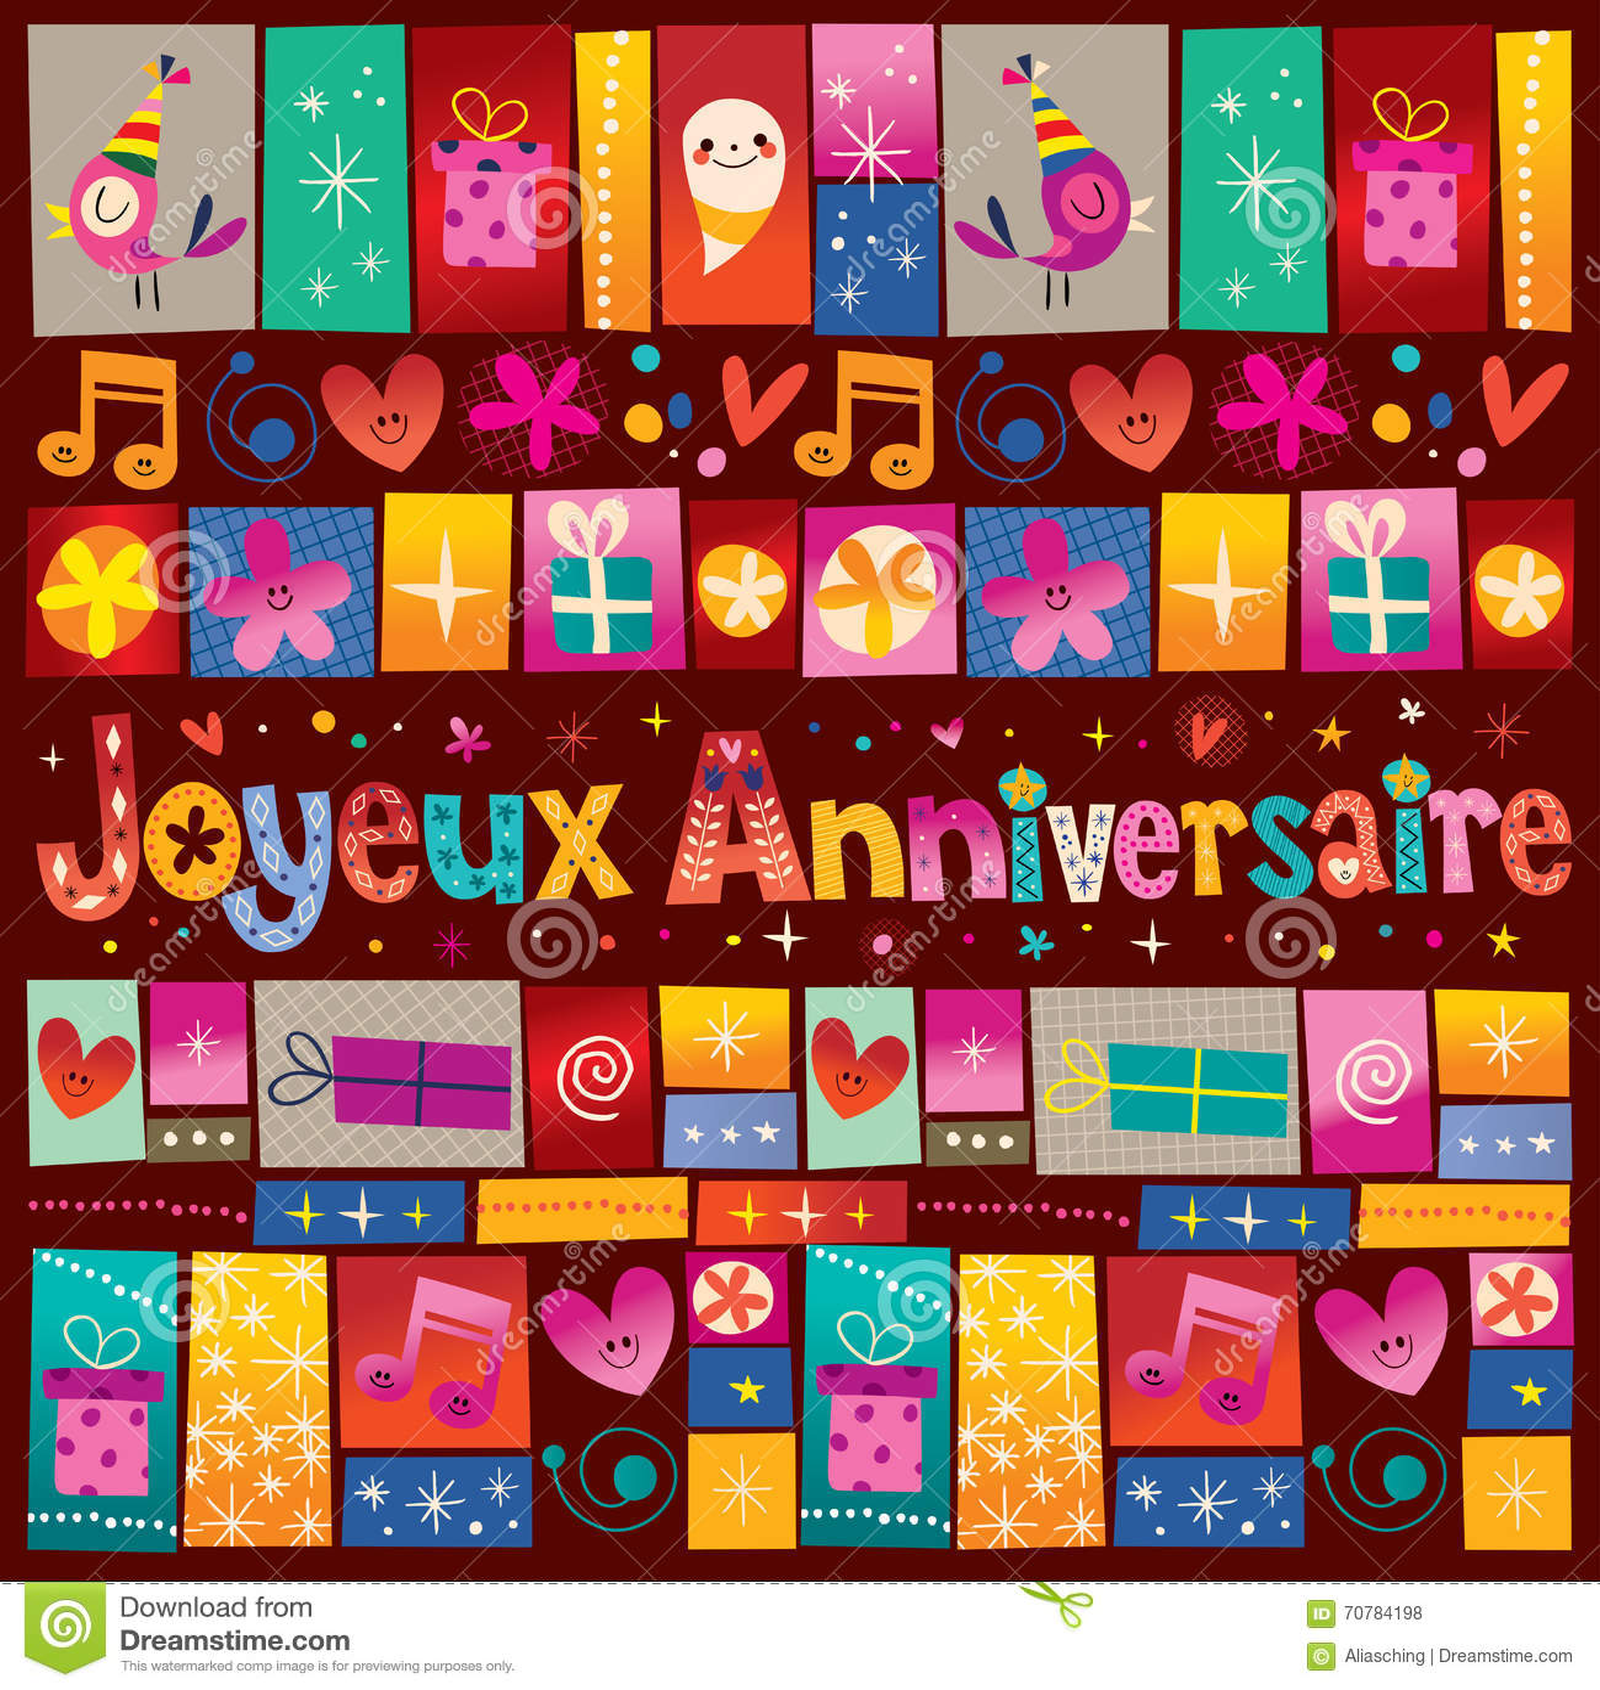 Joyeux anniversaire happy birthday in french stock vector joyeux anniversaire happy birthday in french kristyandbryce Gallery